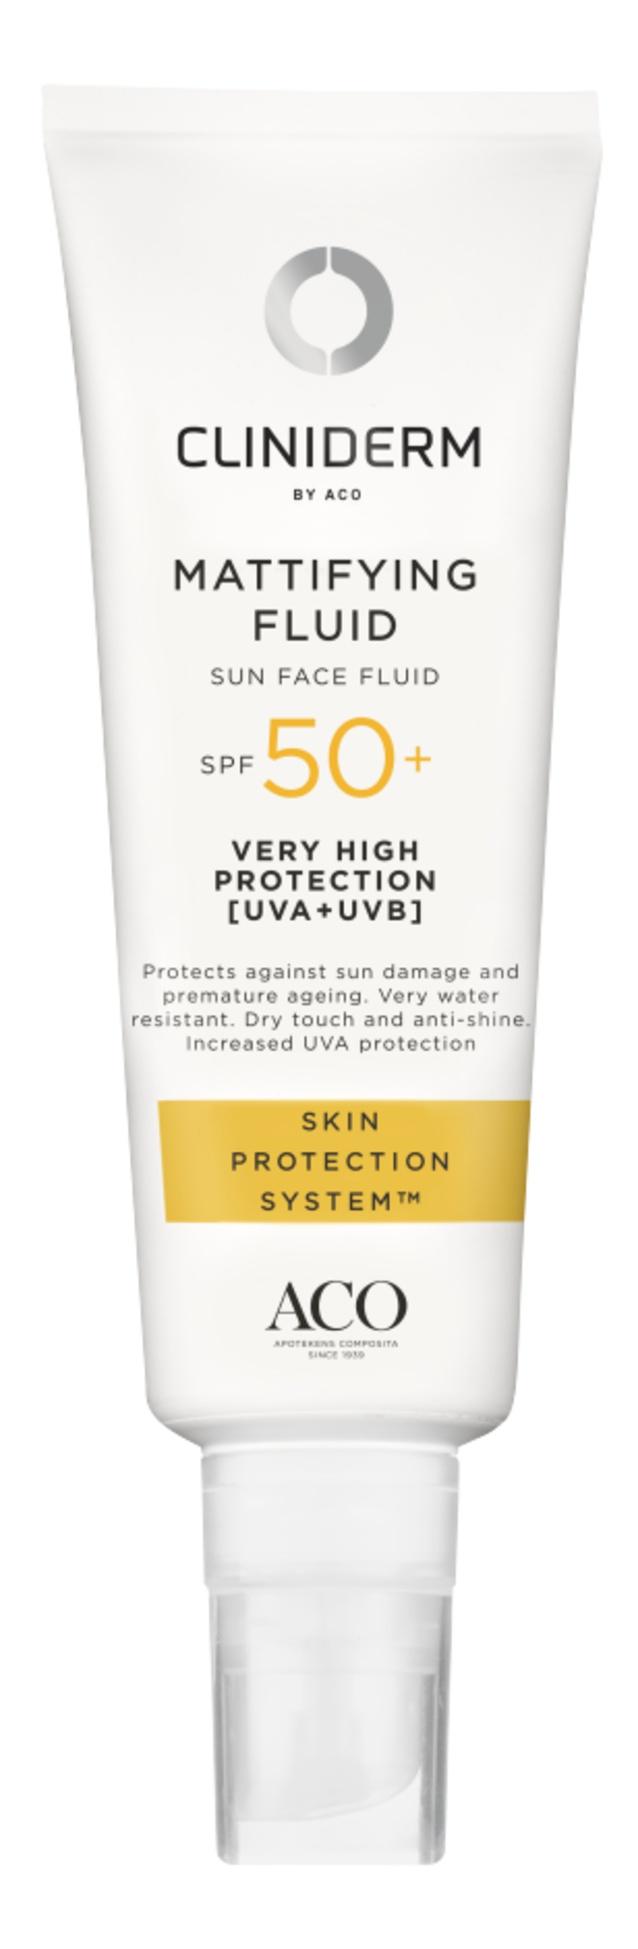 Cliniderm Mattifying Fluid Sun Face Fluid Spf 50+